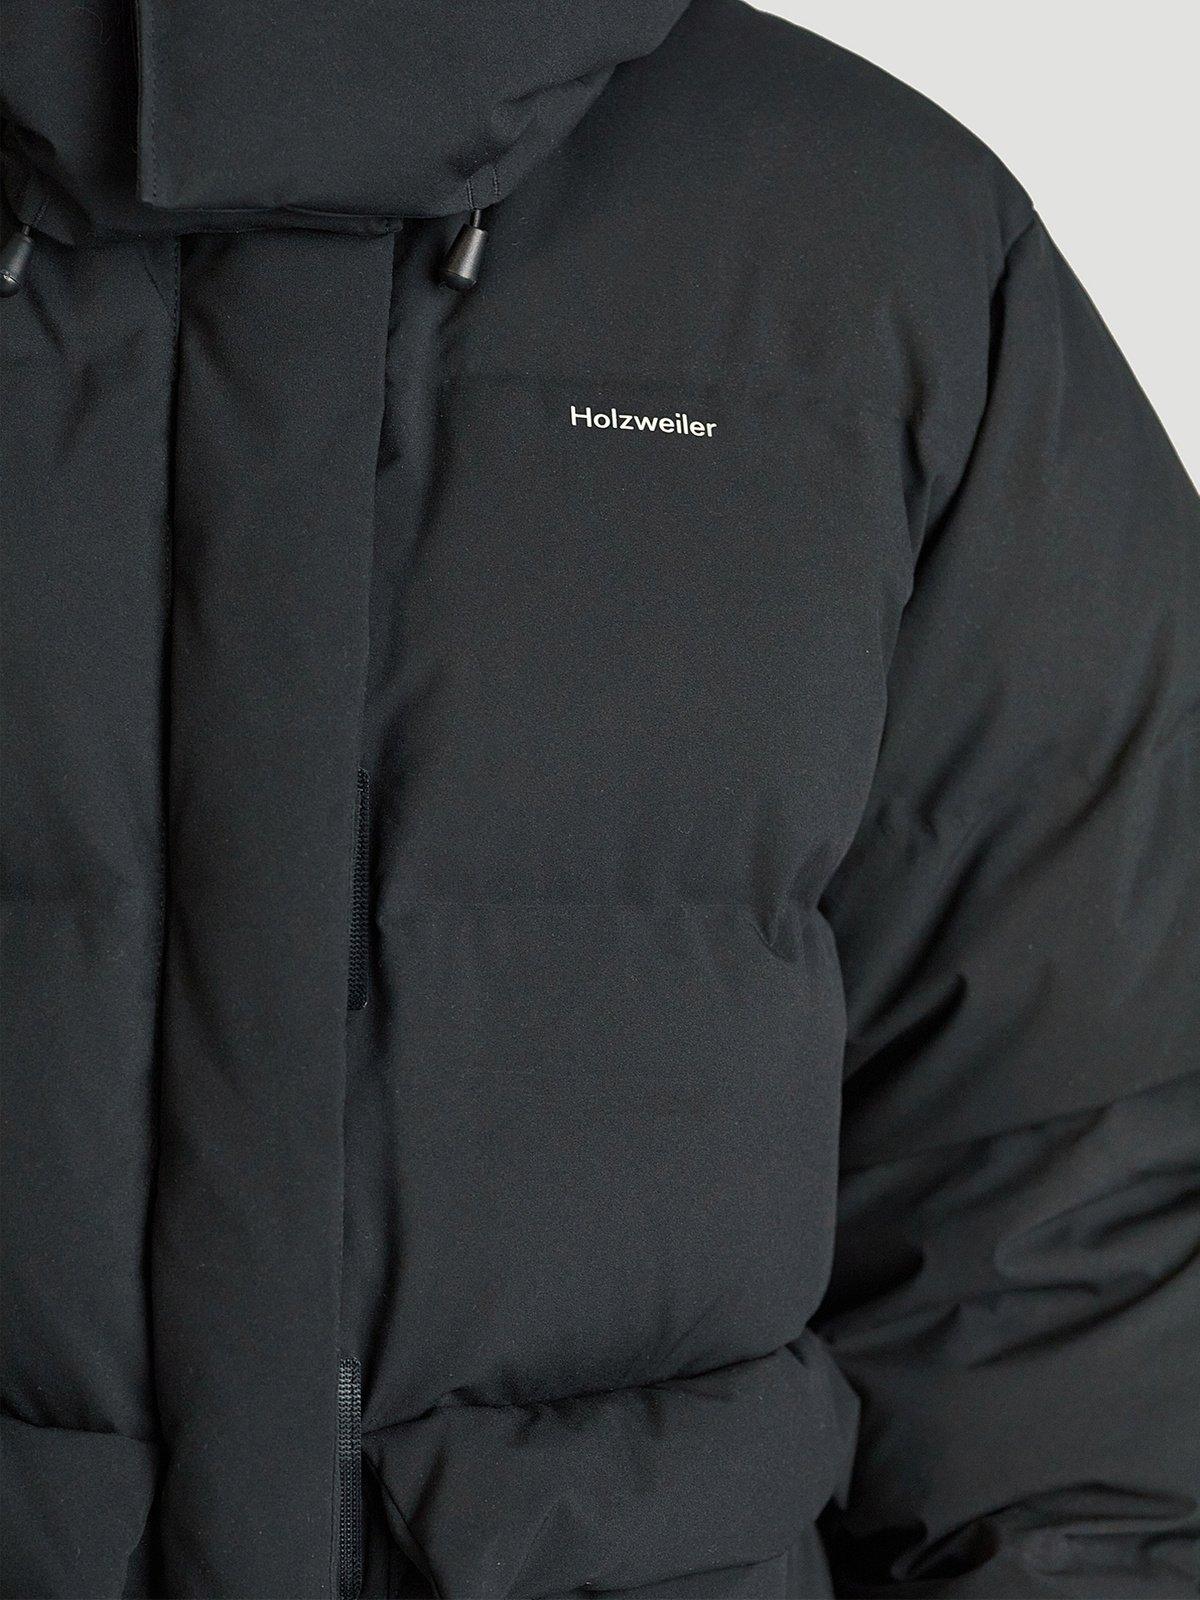 Besseggen Down Jacket Black 1